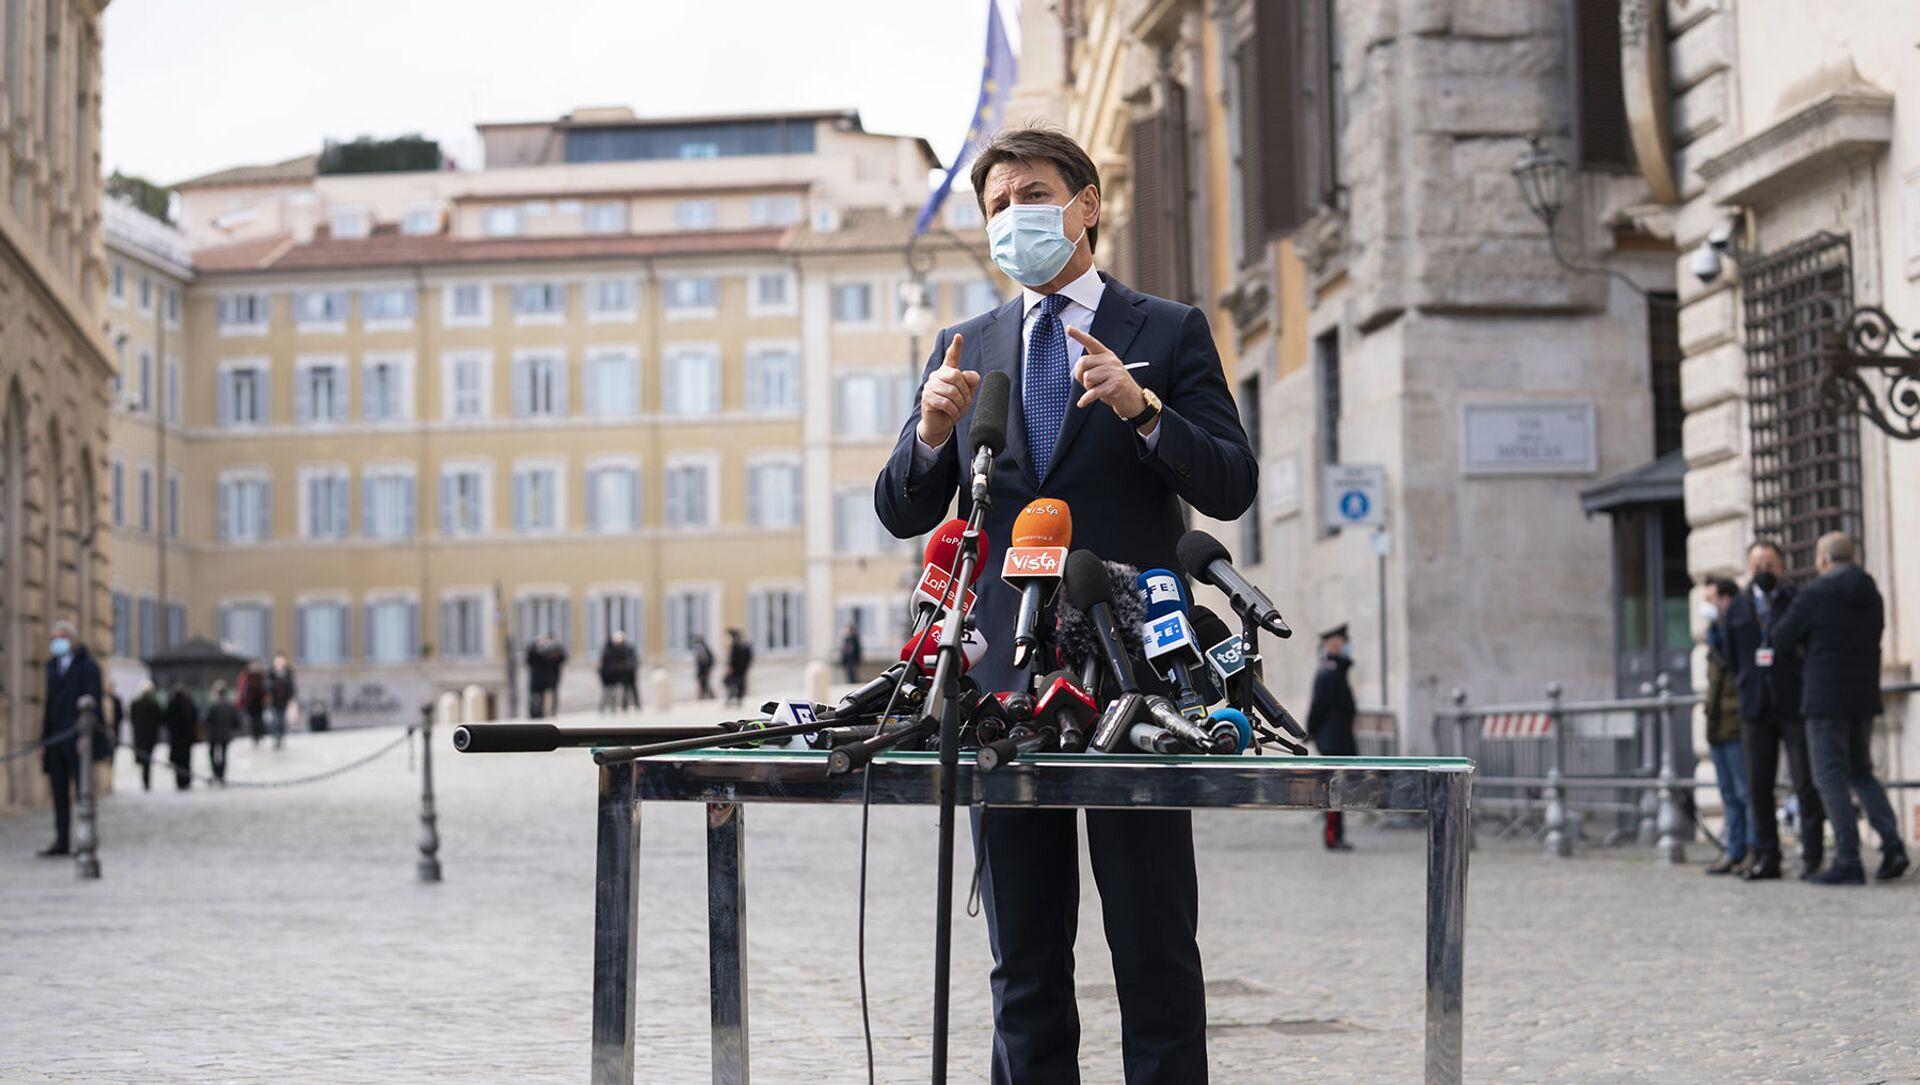 Giuseppe Conte incontra la stampa  - Sputnik Italia, 1920, 12.05.2021